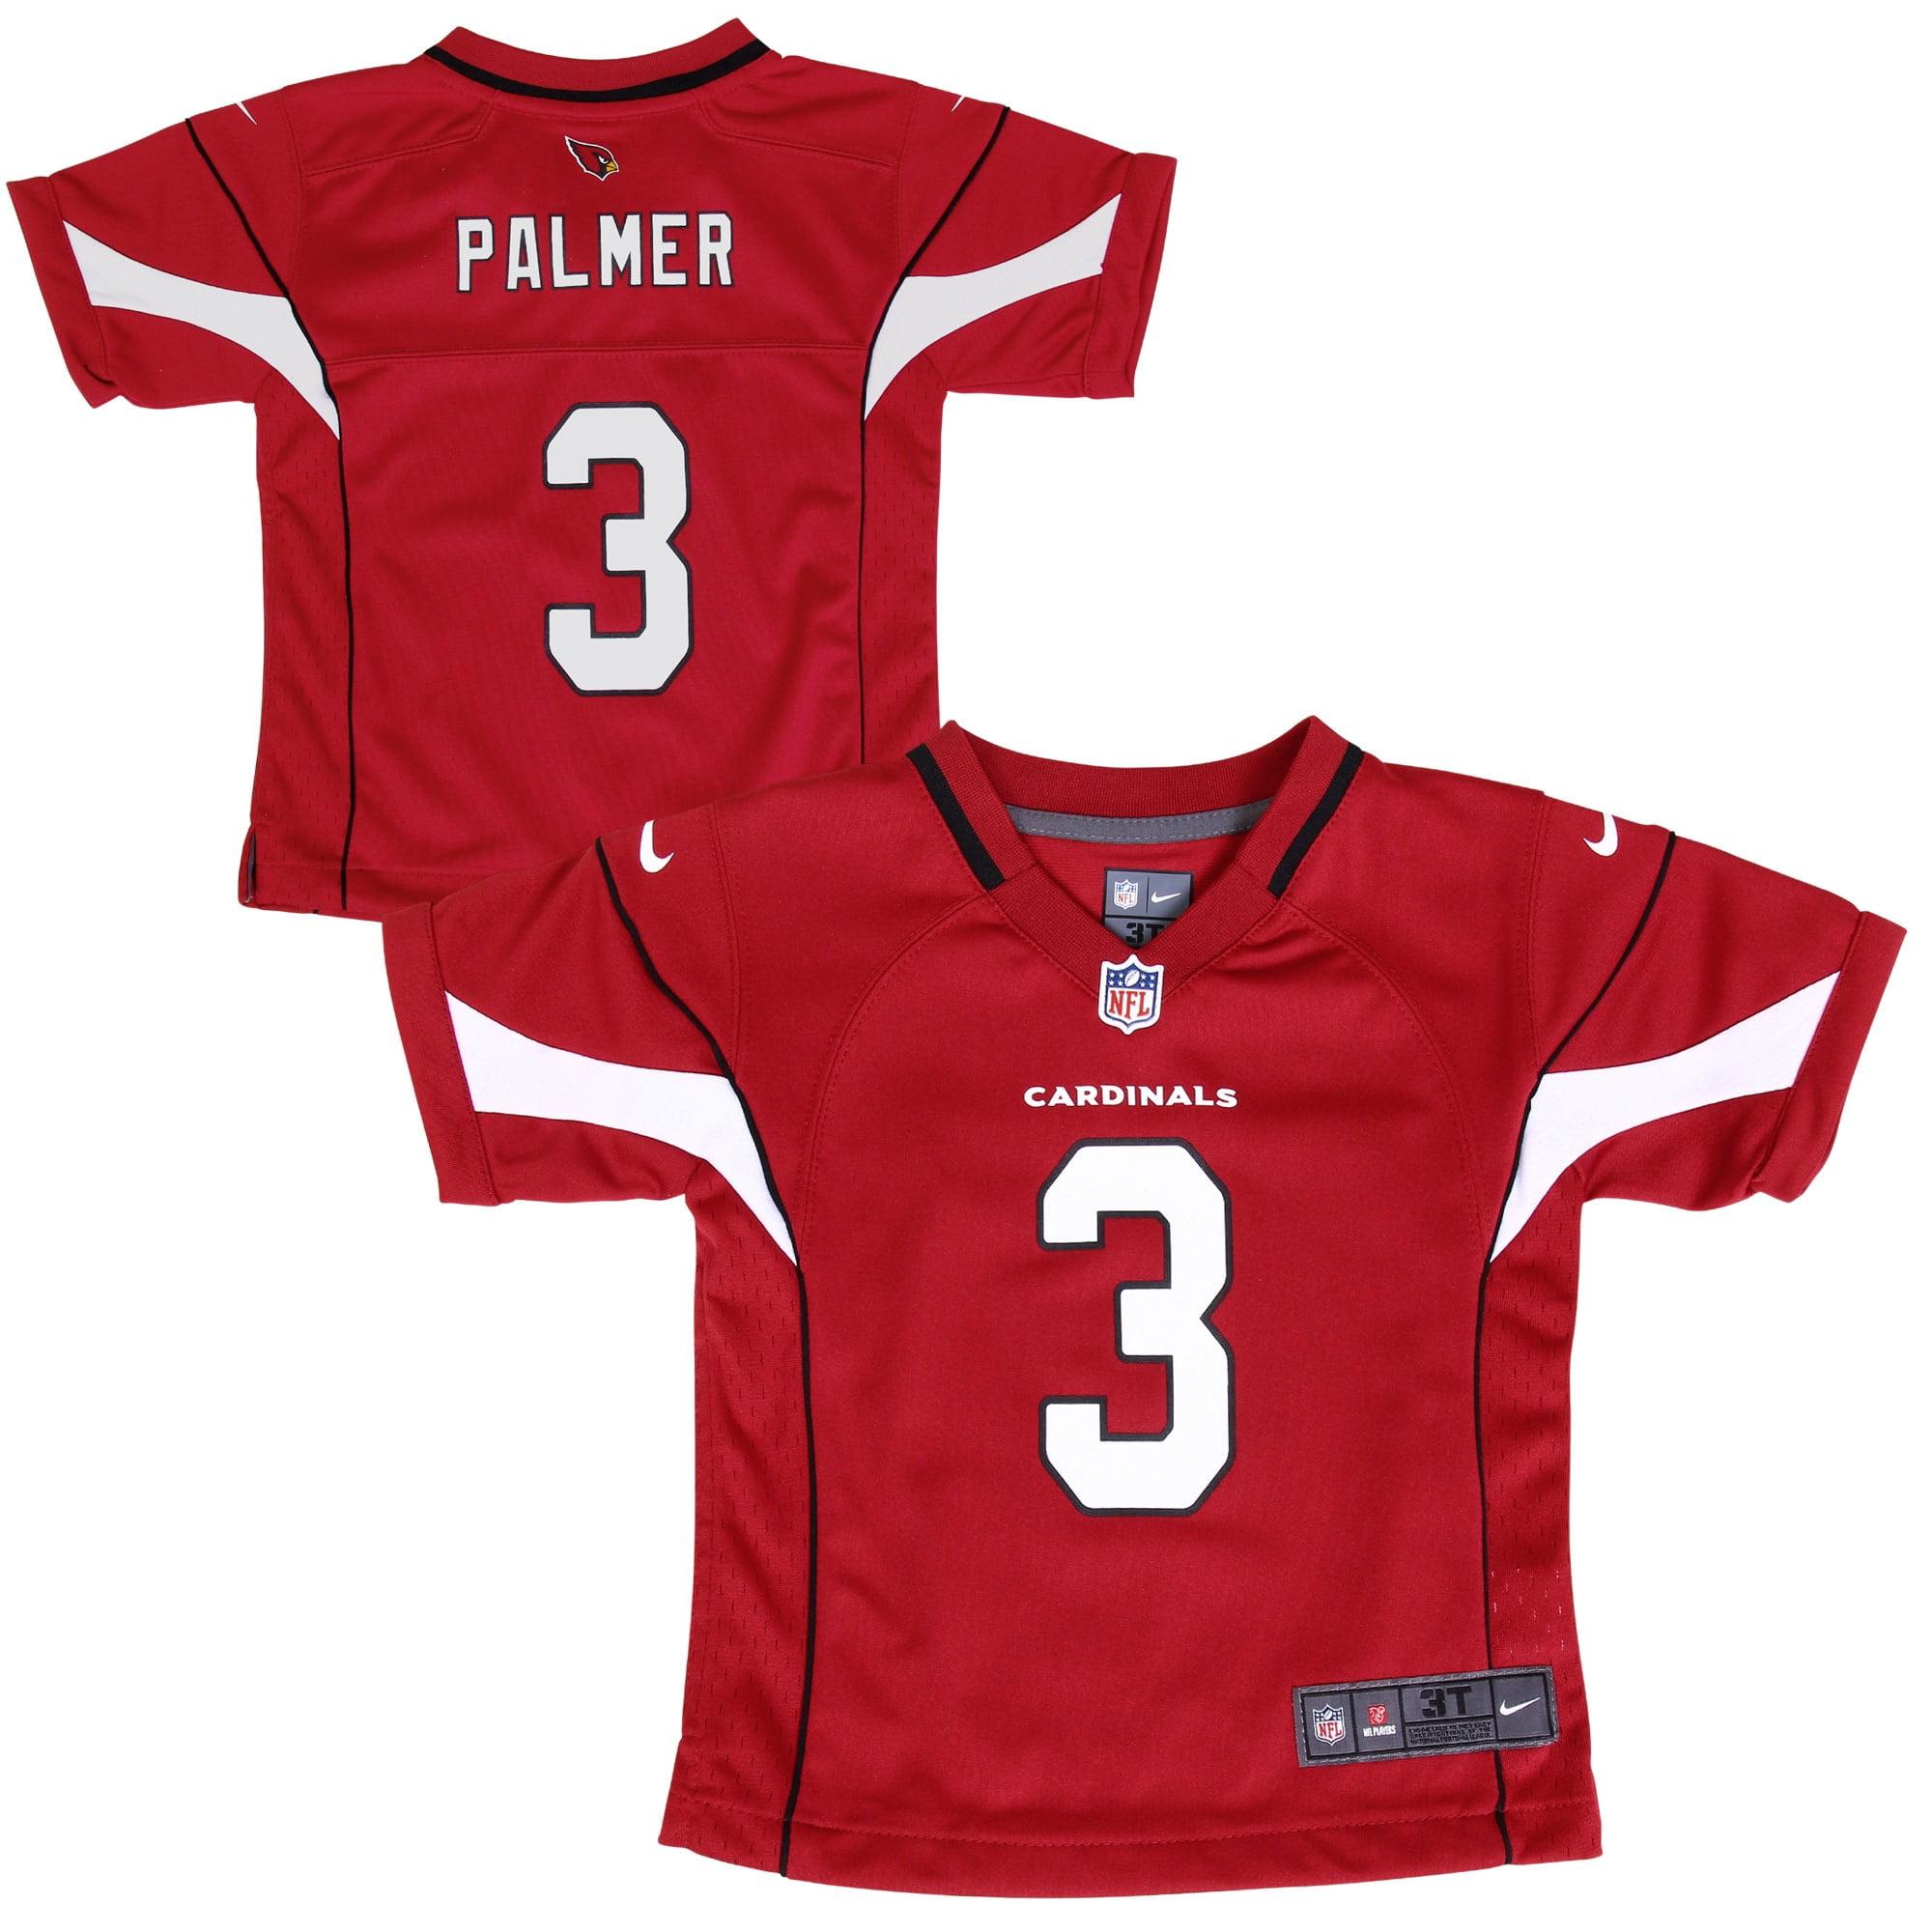 Carson Palmer USC Trojans Football Jersey - Cardinal